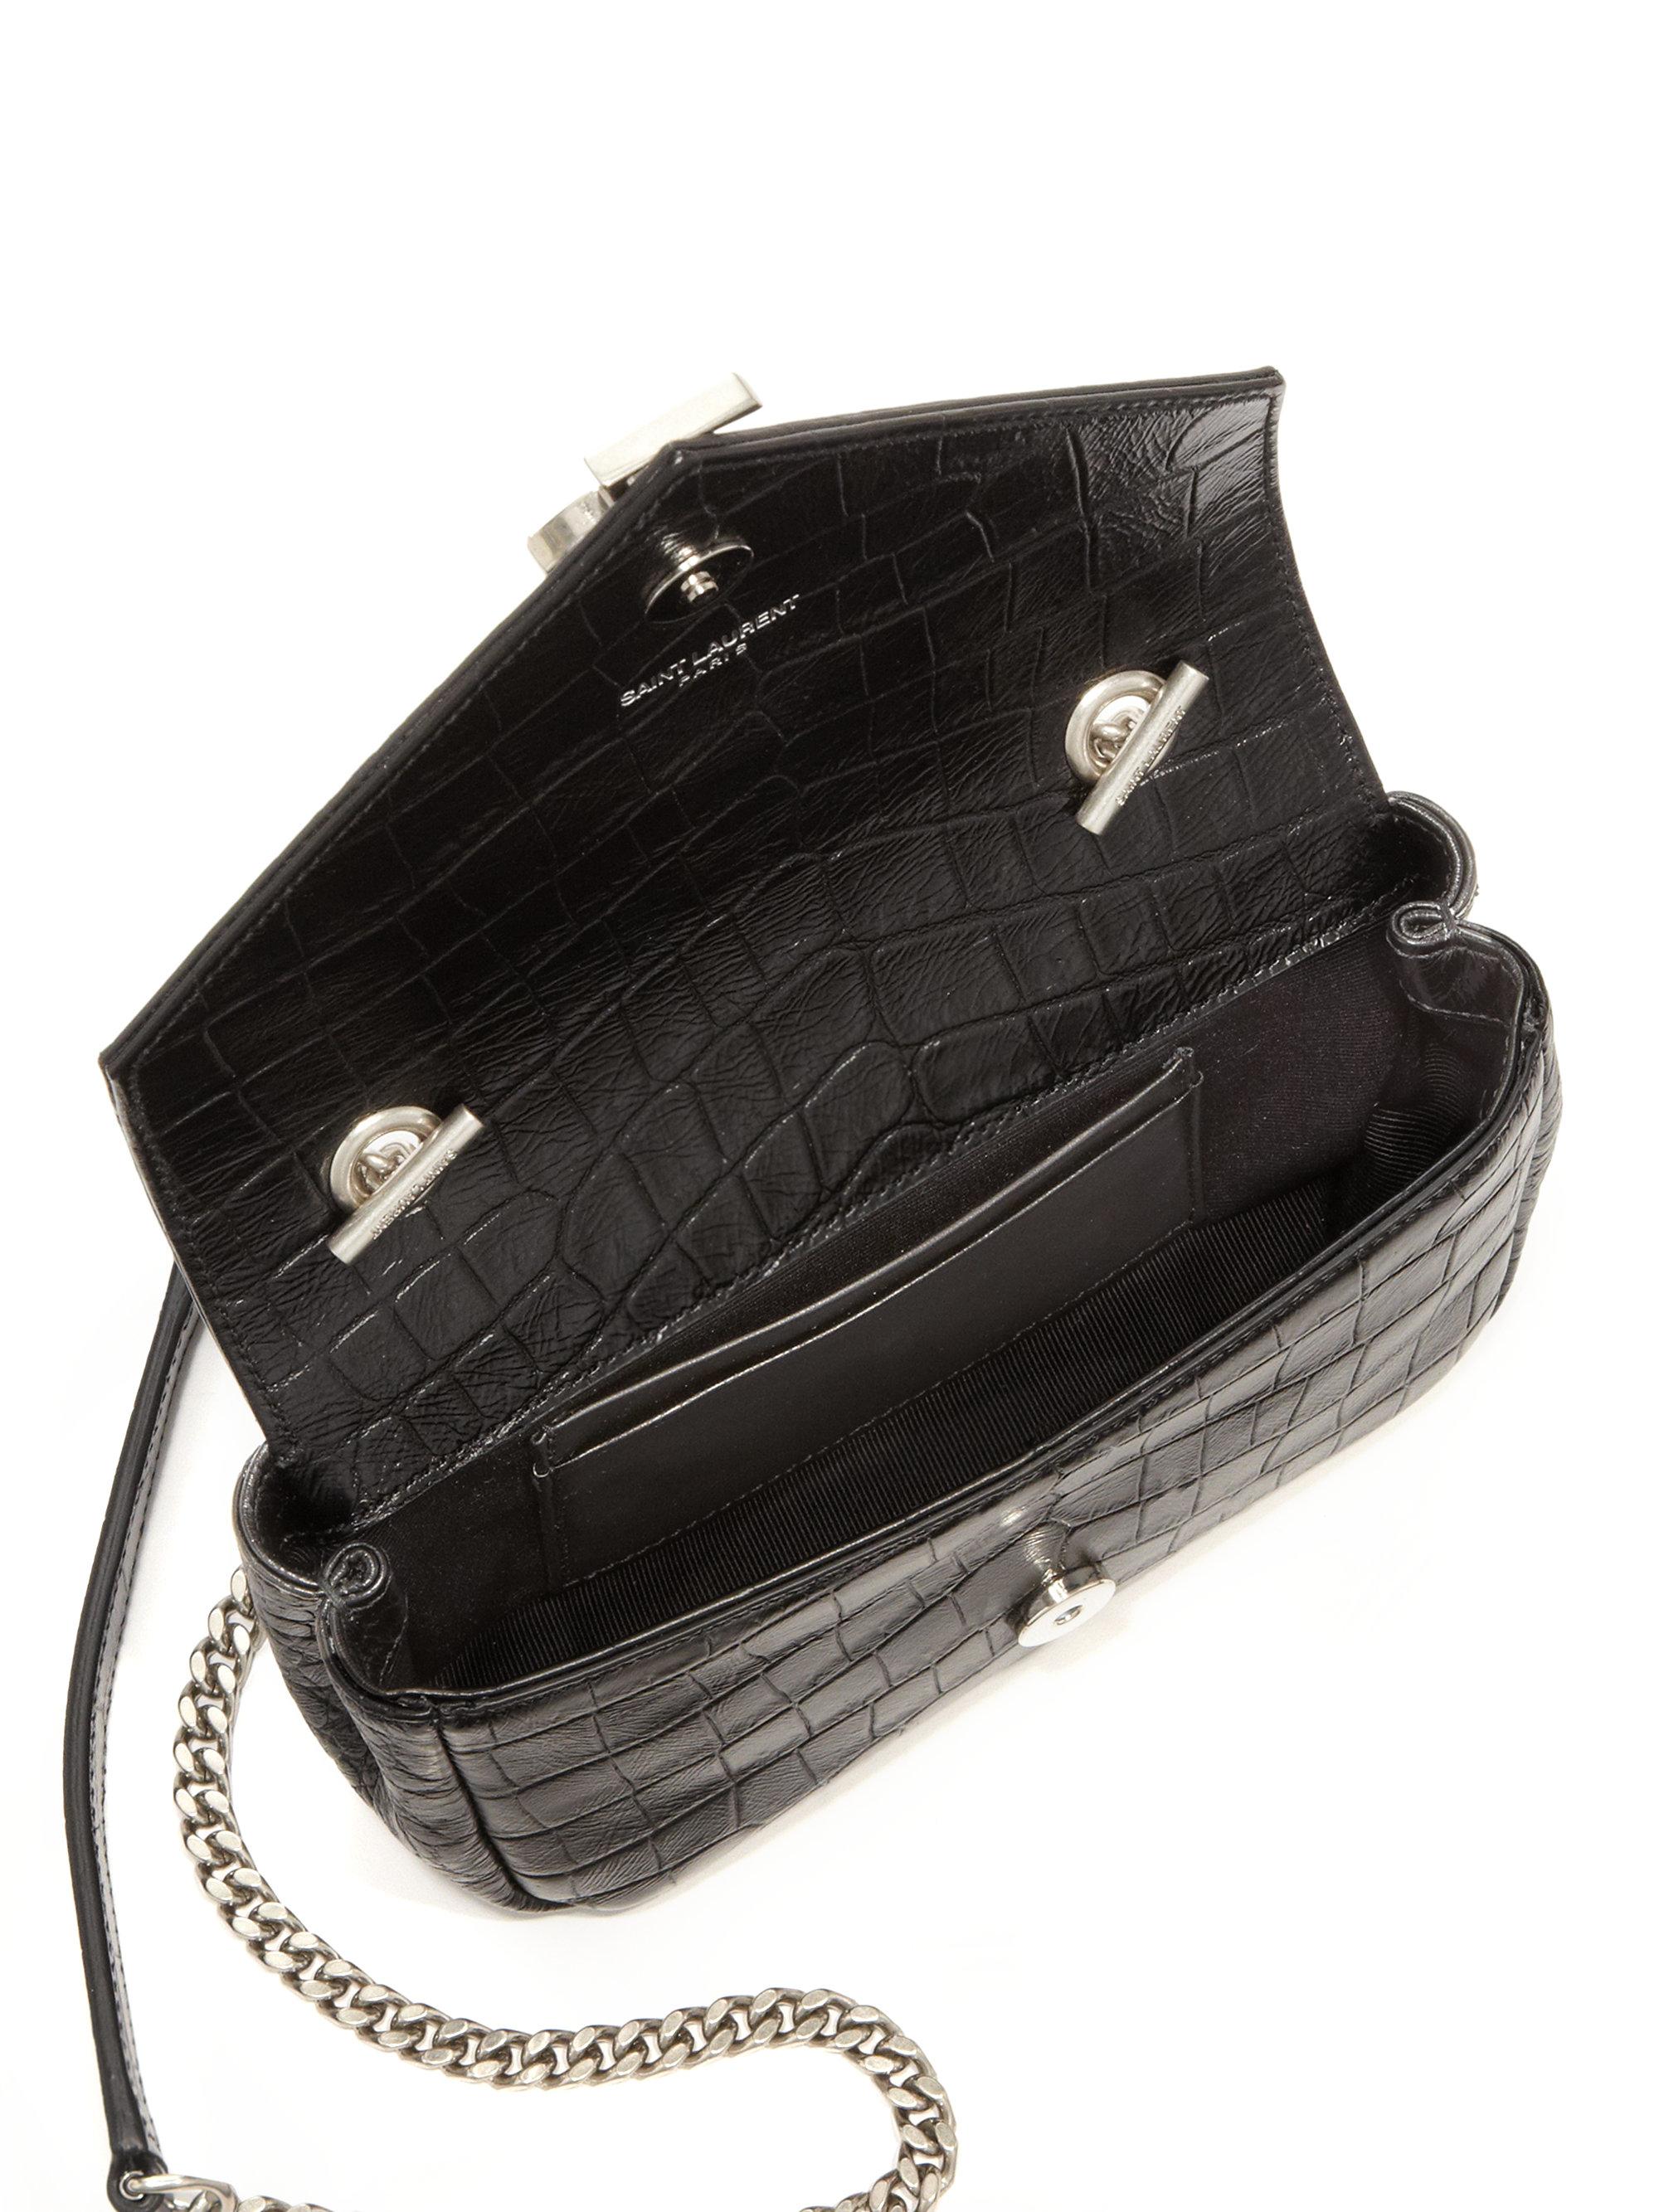 saint laurent purses - monogram saint laurent chain wallet in black crocodile embossed ...